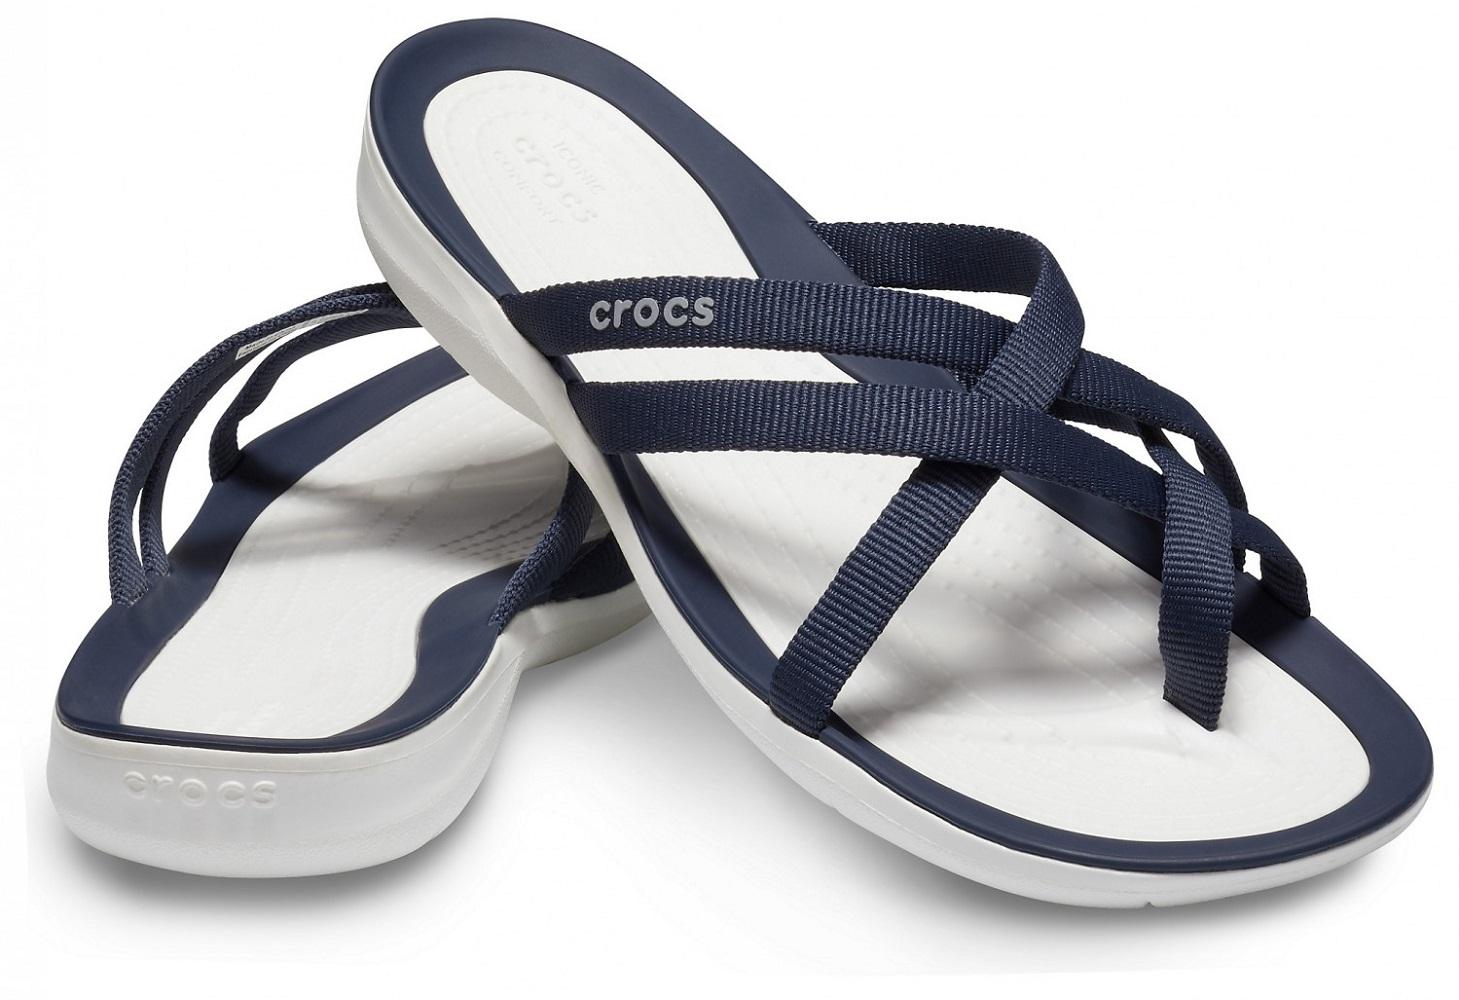 crocs-womens-swiftwater-webbing-flip-sandals-detail-2